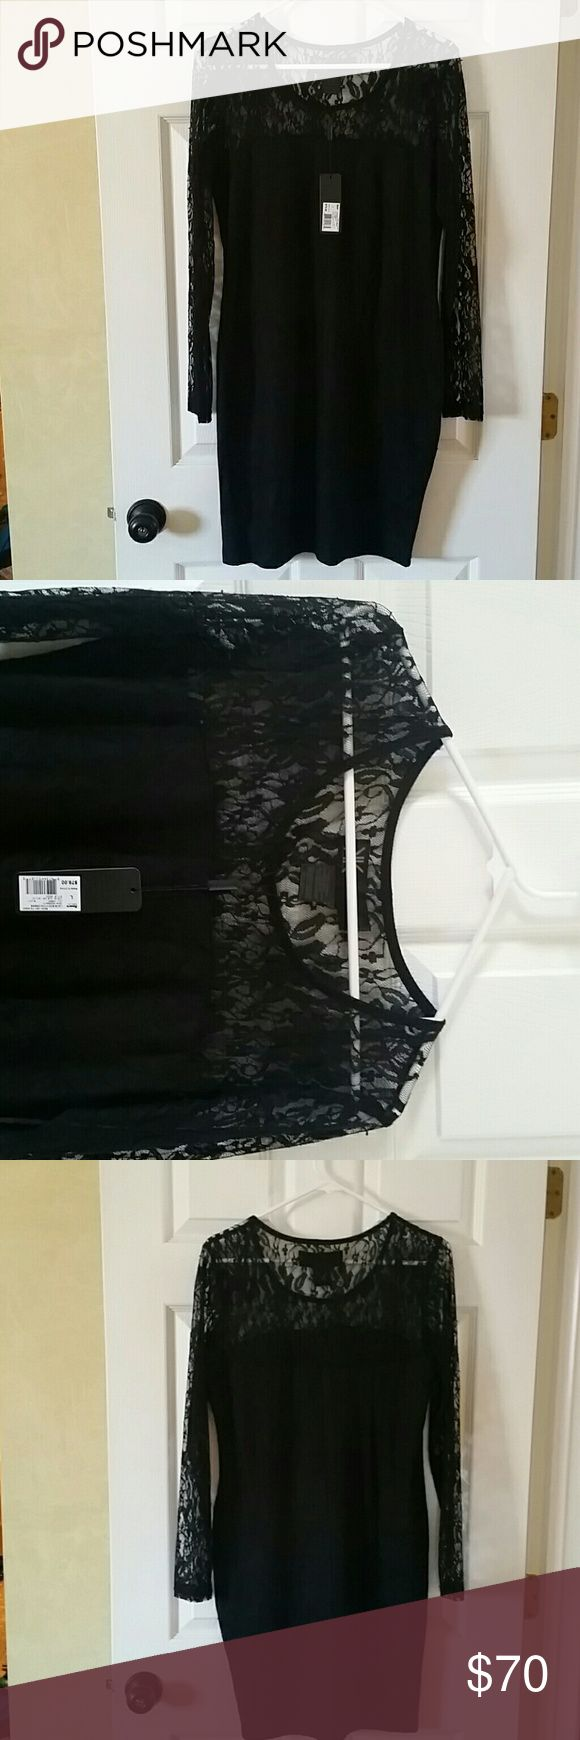 Dress Black Kim Kardashian Kollection size large lace dress long sleeve very sexy kim kardashian Dresses Midi